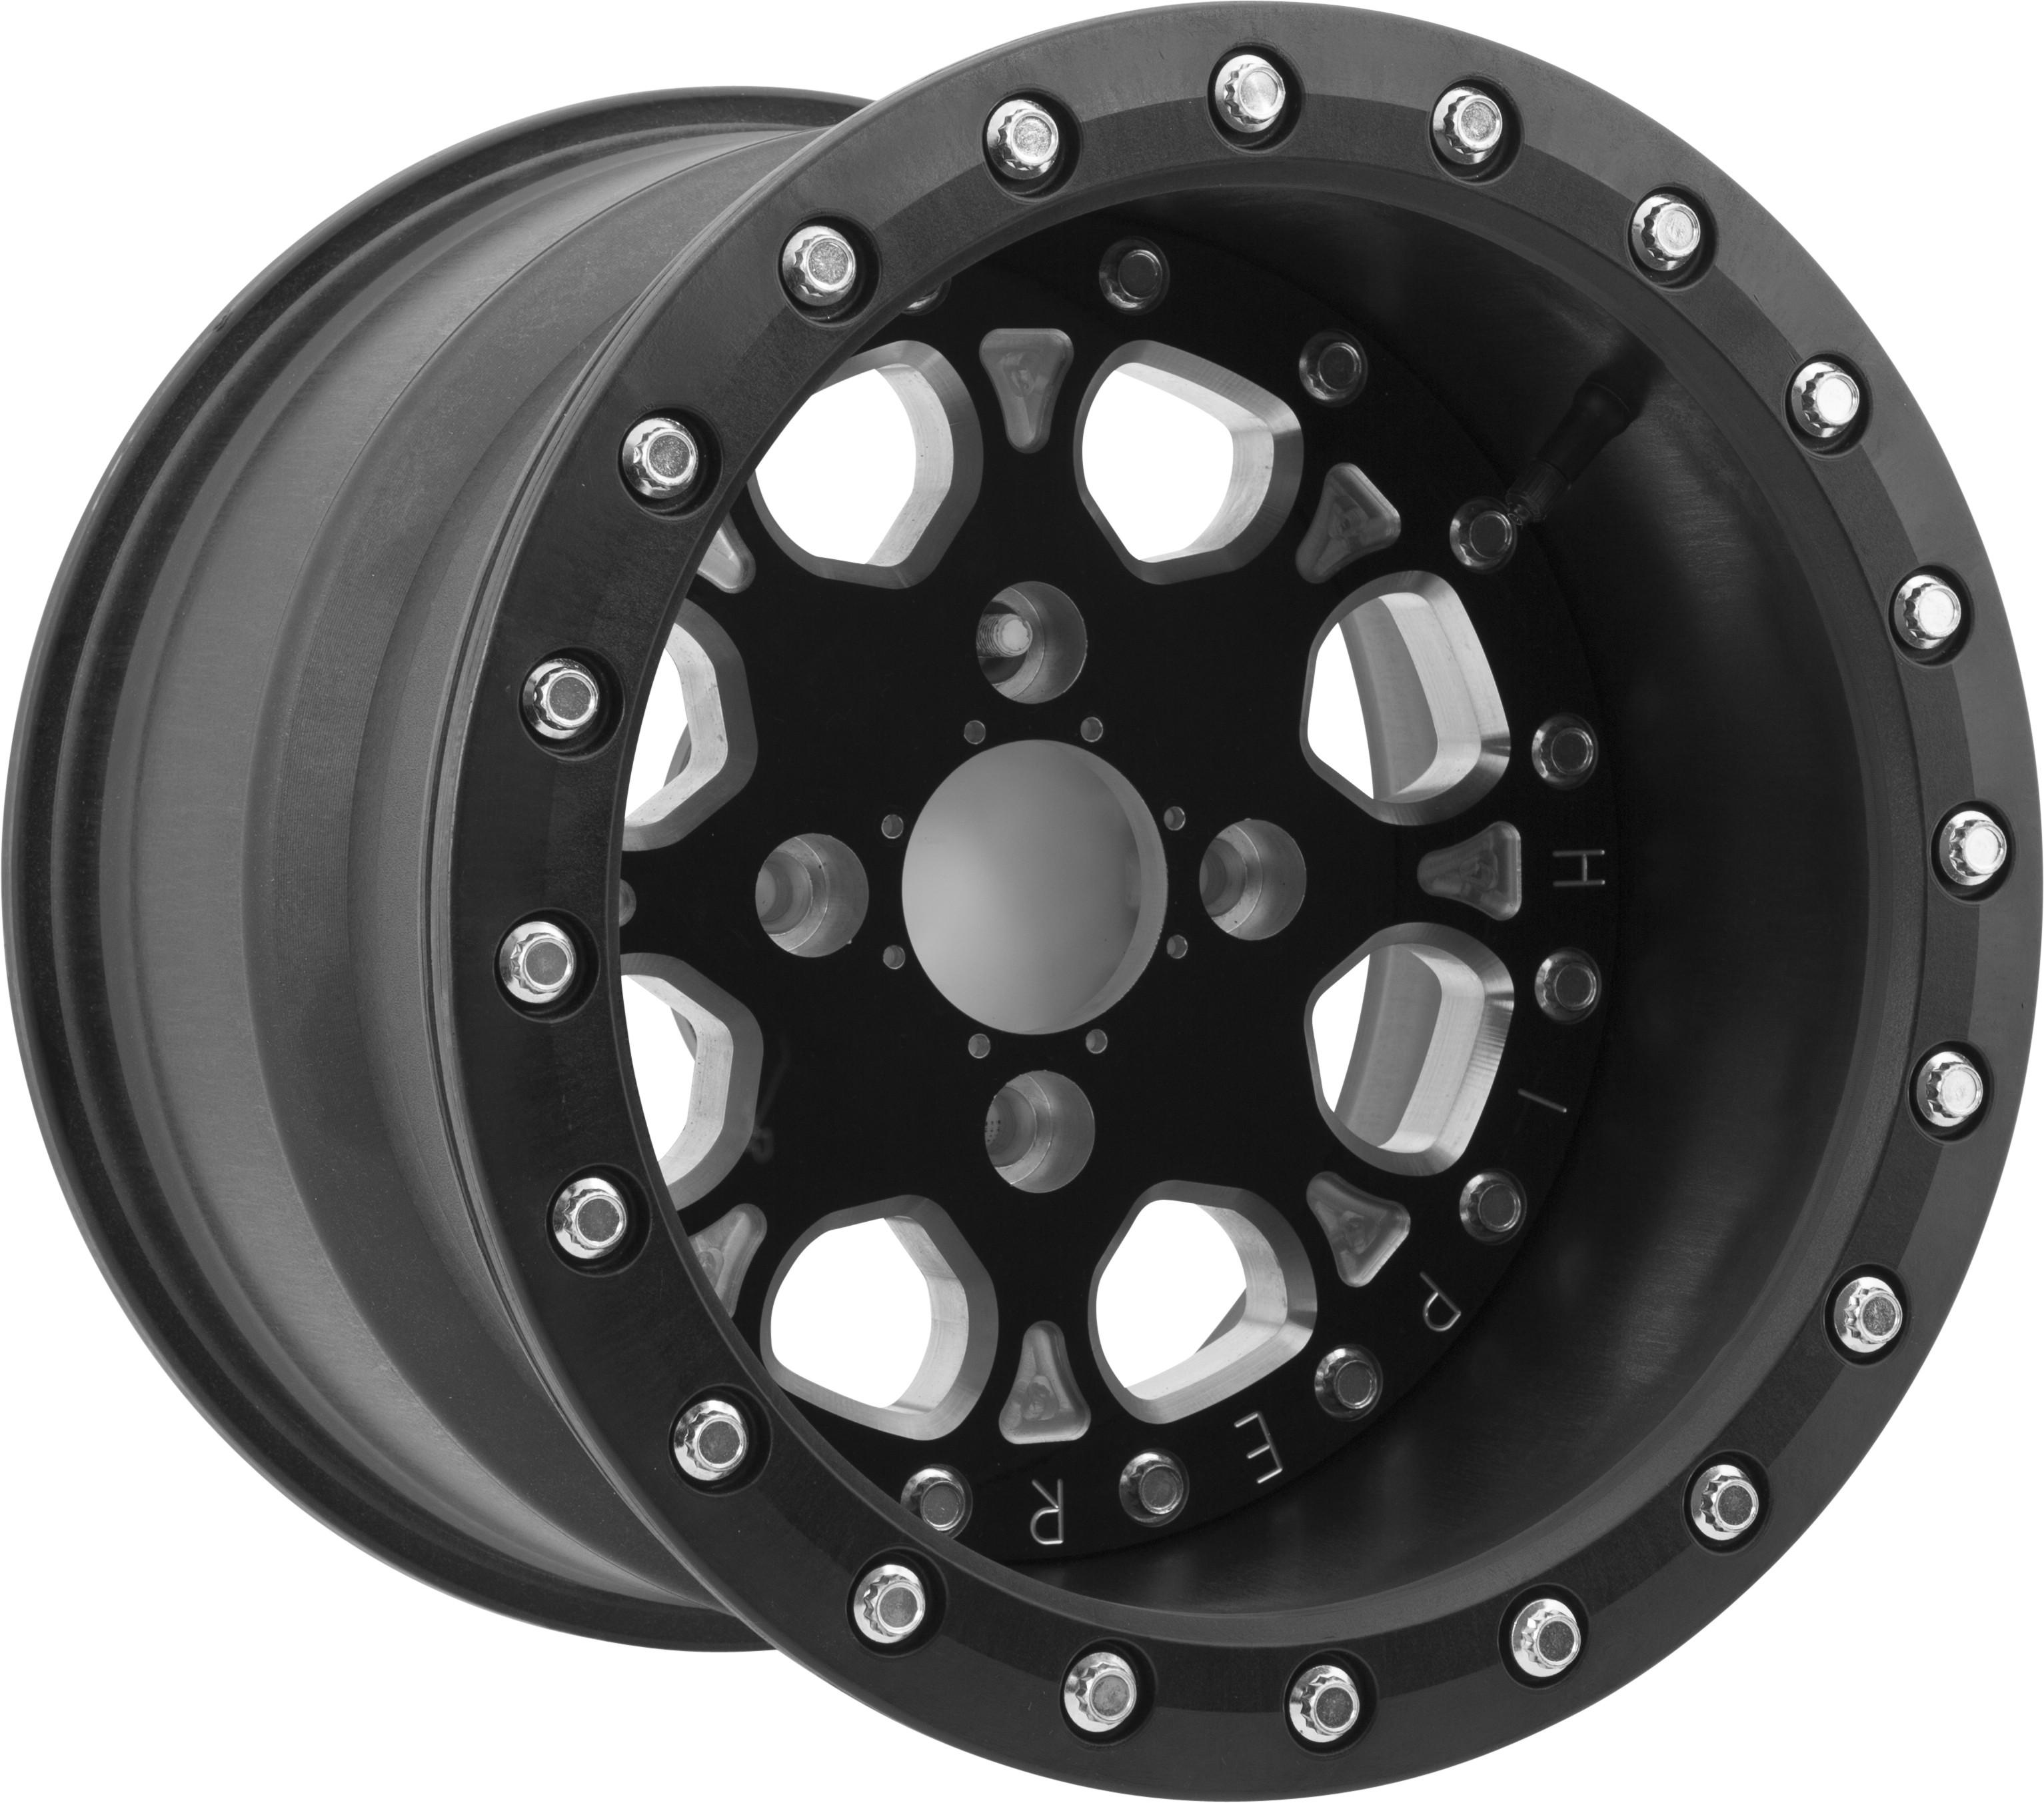 DWT DOUGLAS WHEEL Ultimate G3 Wheels 4//110 8X8 3+5 Single Beadlock G3-06-489